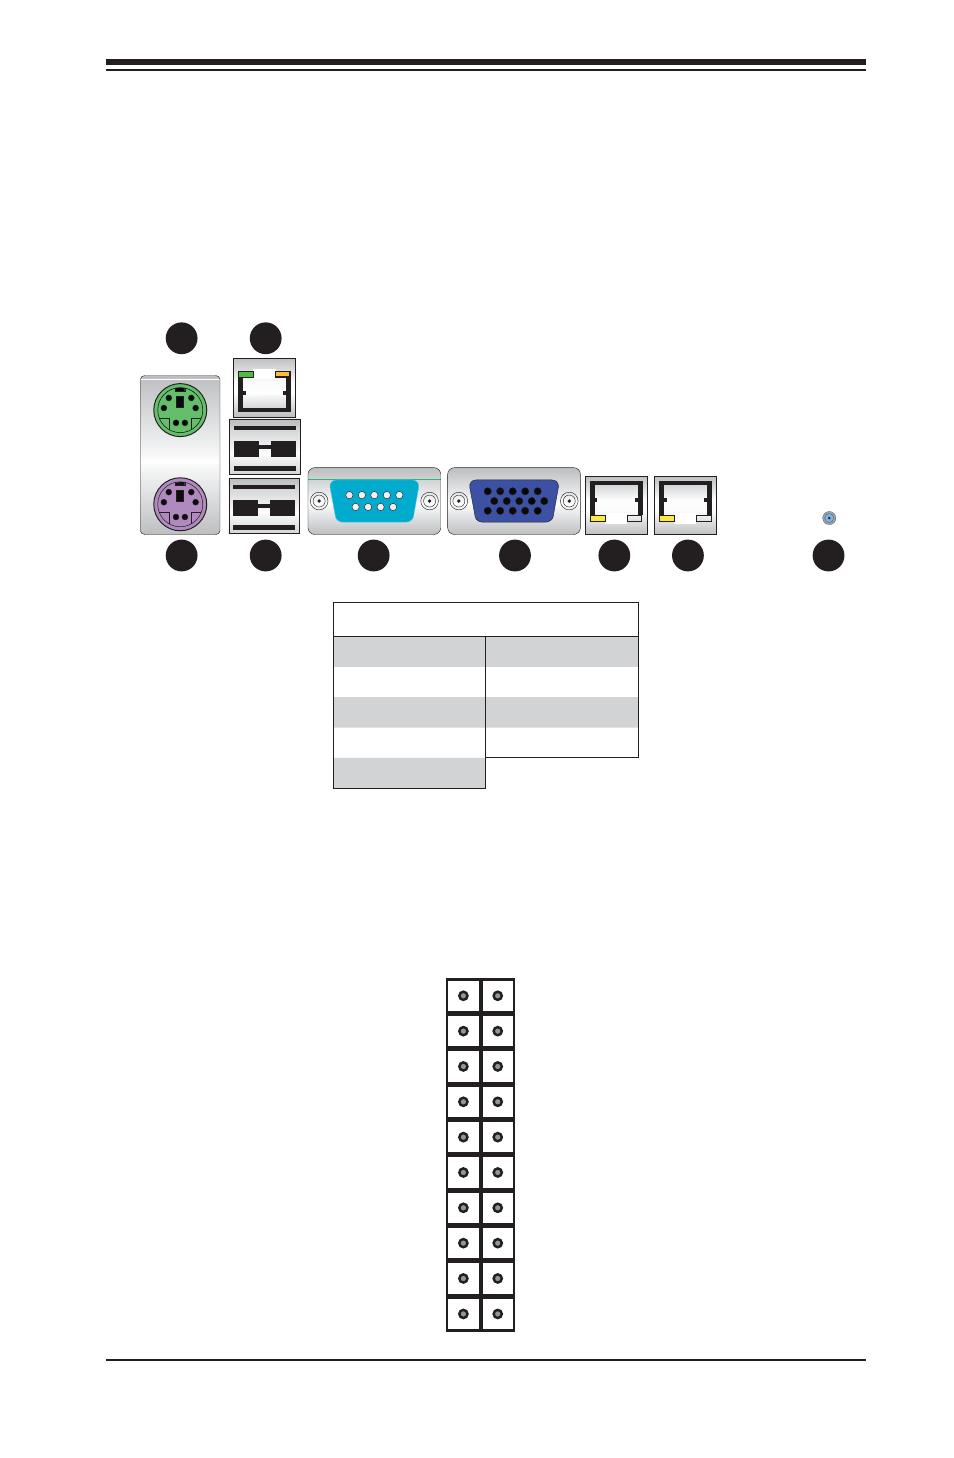 6 i o port and control panel connections front control panel rh manualsdir com Wire Connectors Molex Microfit Connector